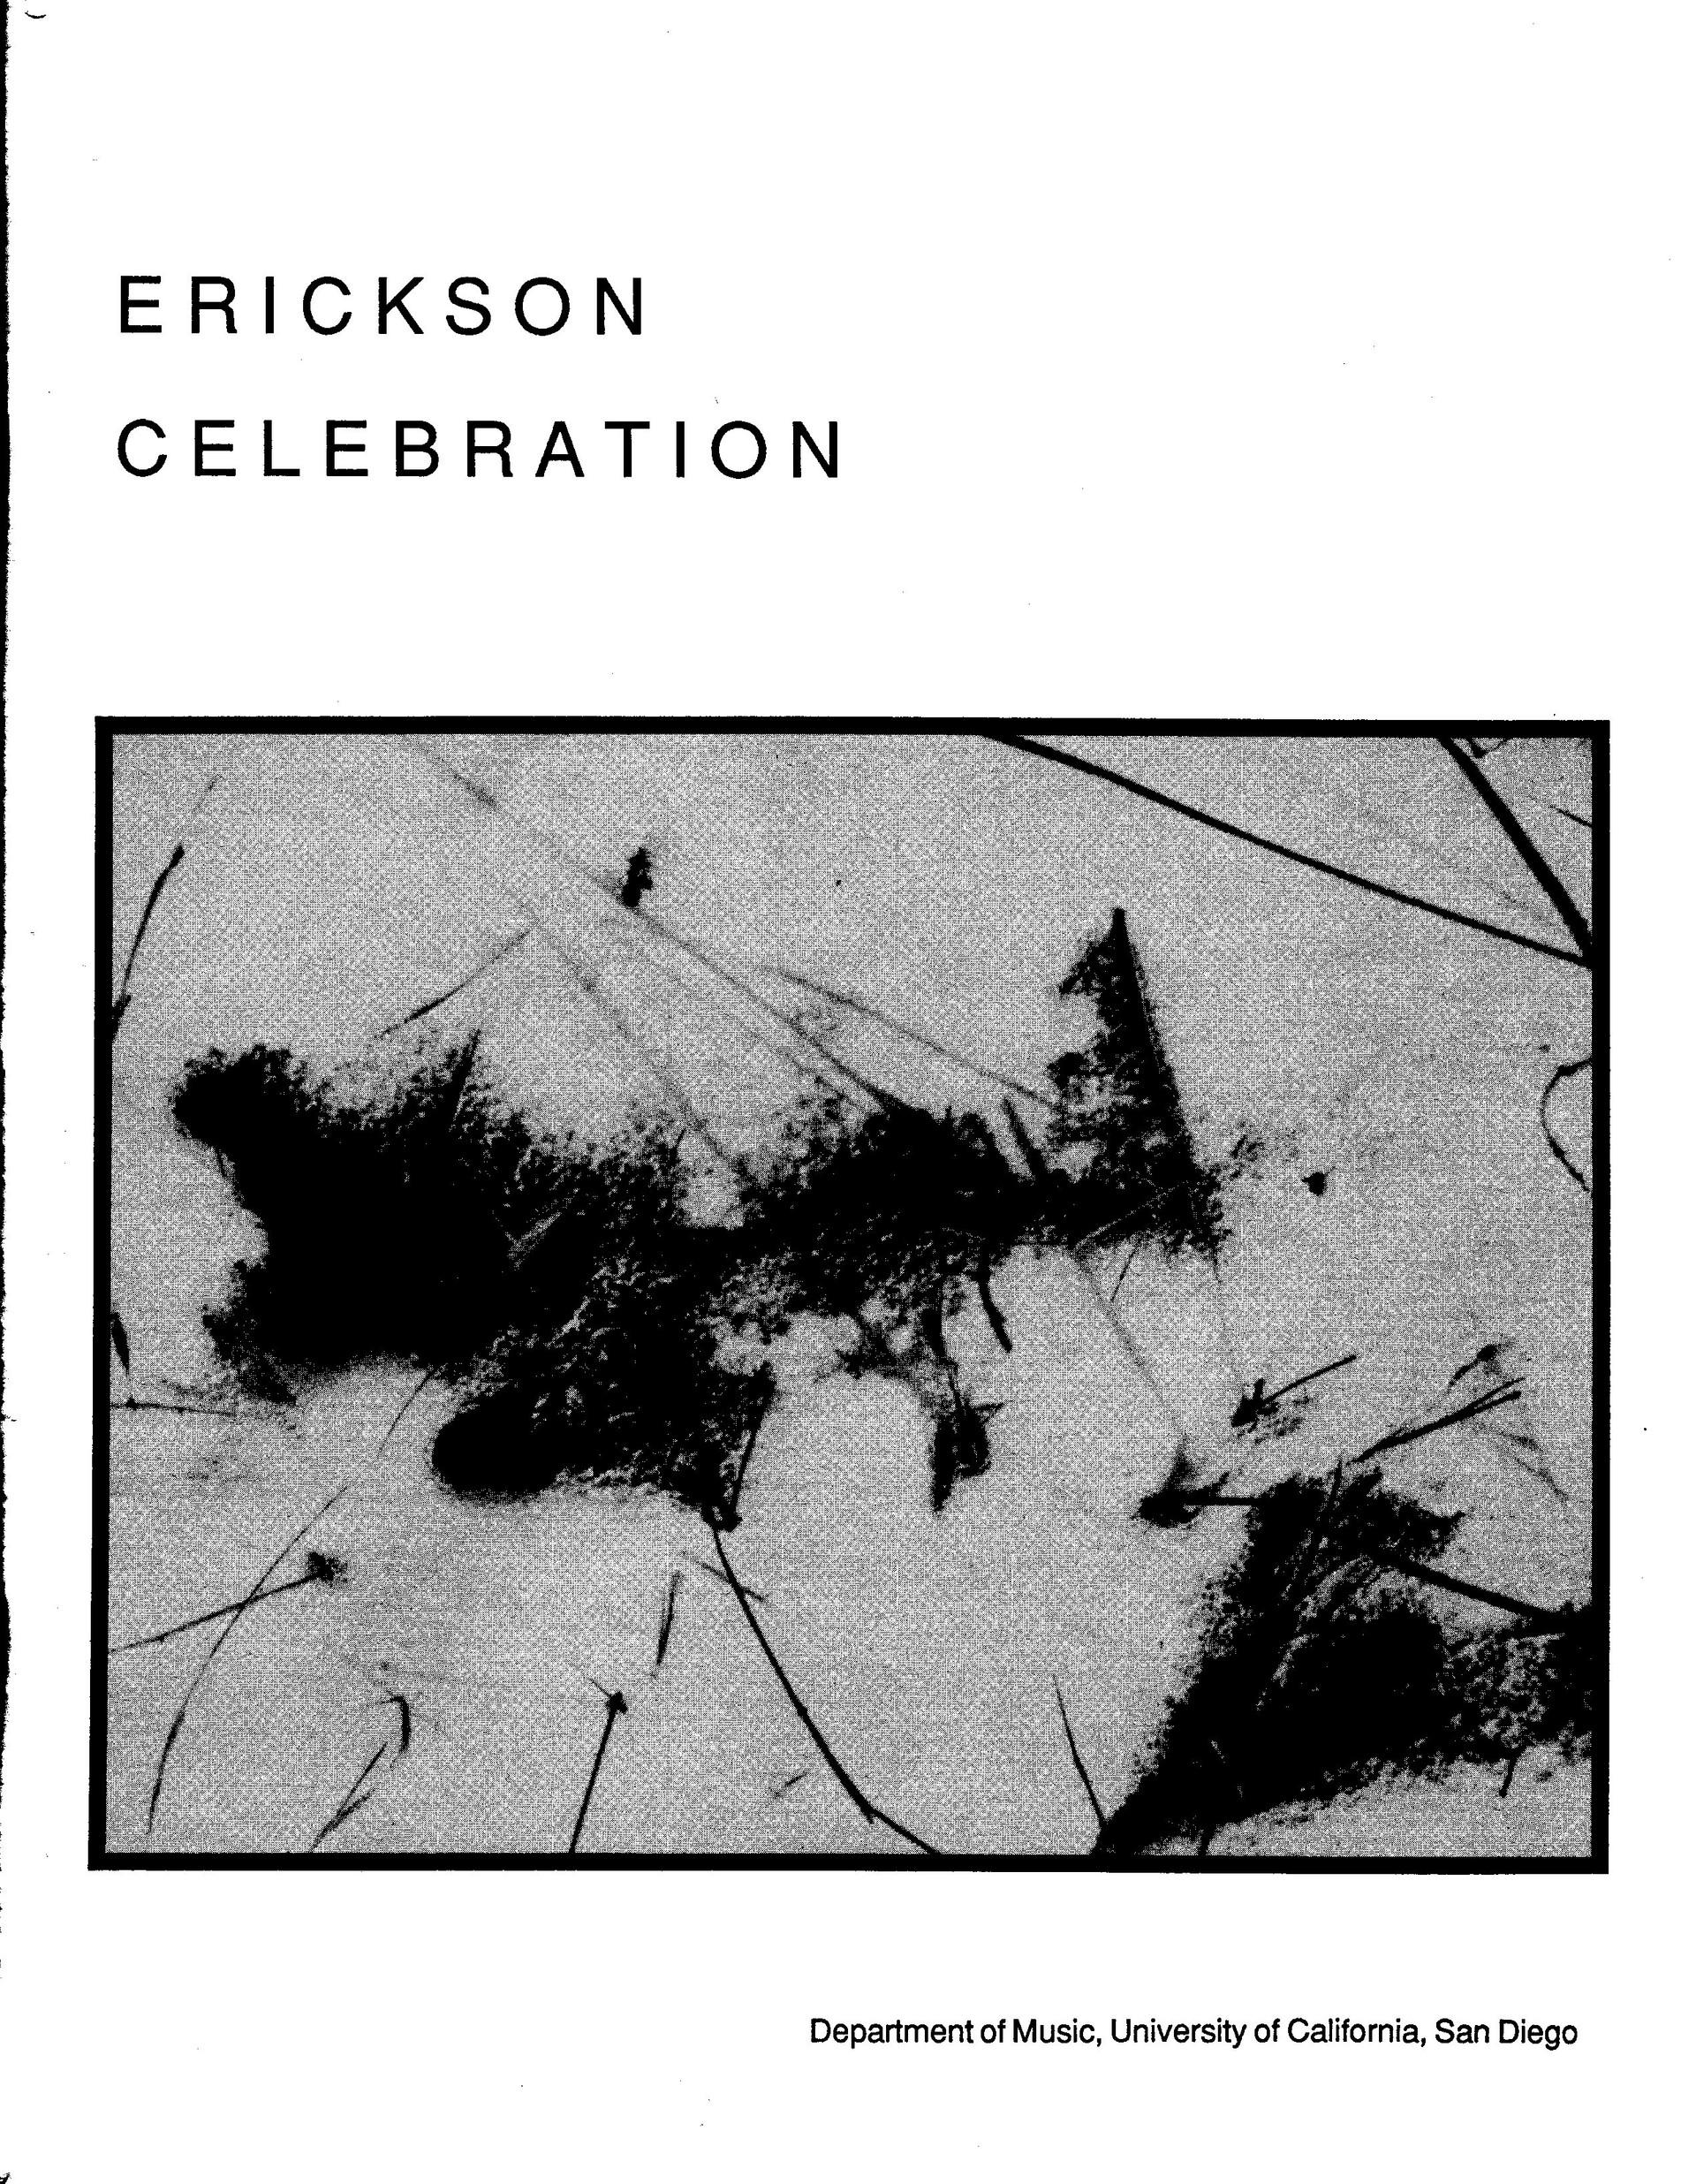 1987 Erickson Celebration.jpg